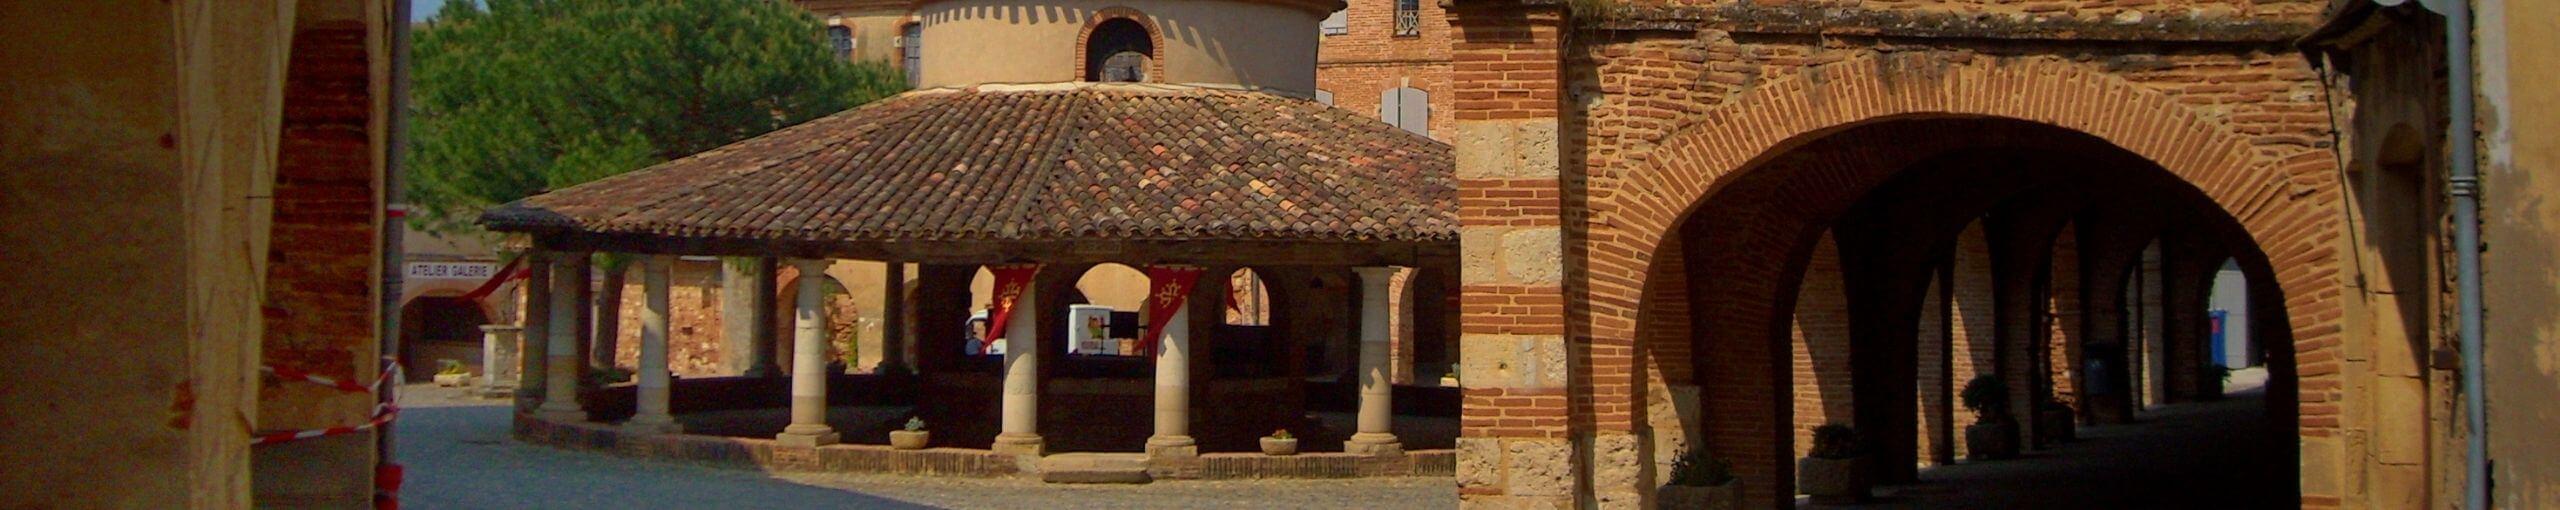 Auvillar a Orillas del Garona. Tarn y Garona, Occitania. Francia.